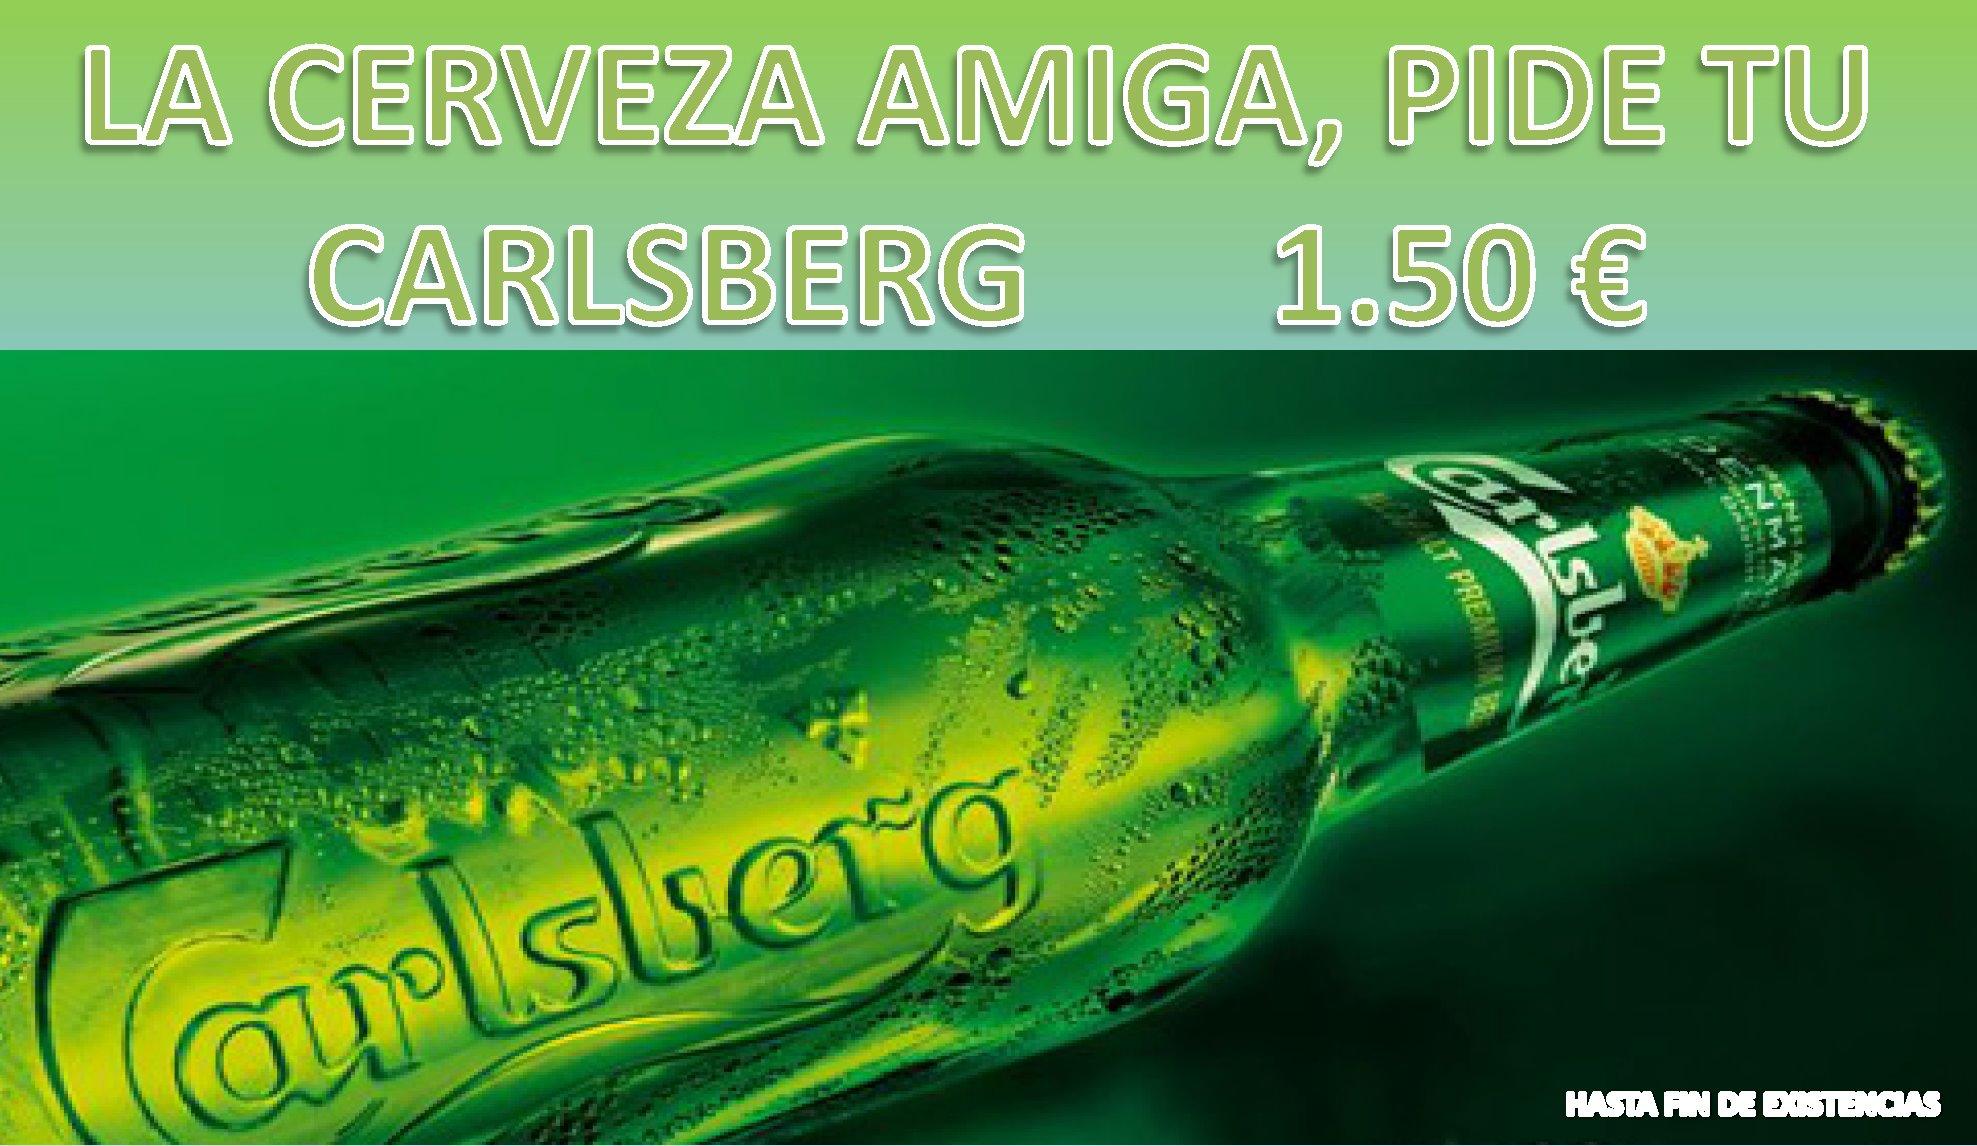 Super Promo Carlsberg A 1 50 Hasta Fin De Existencias